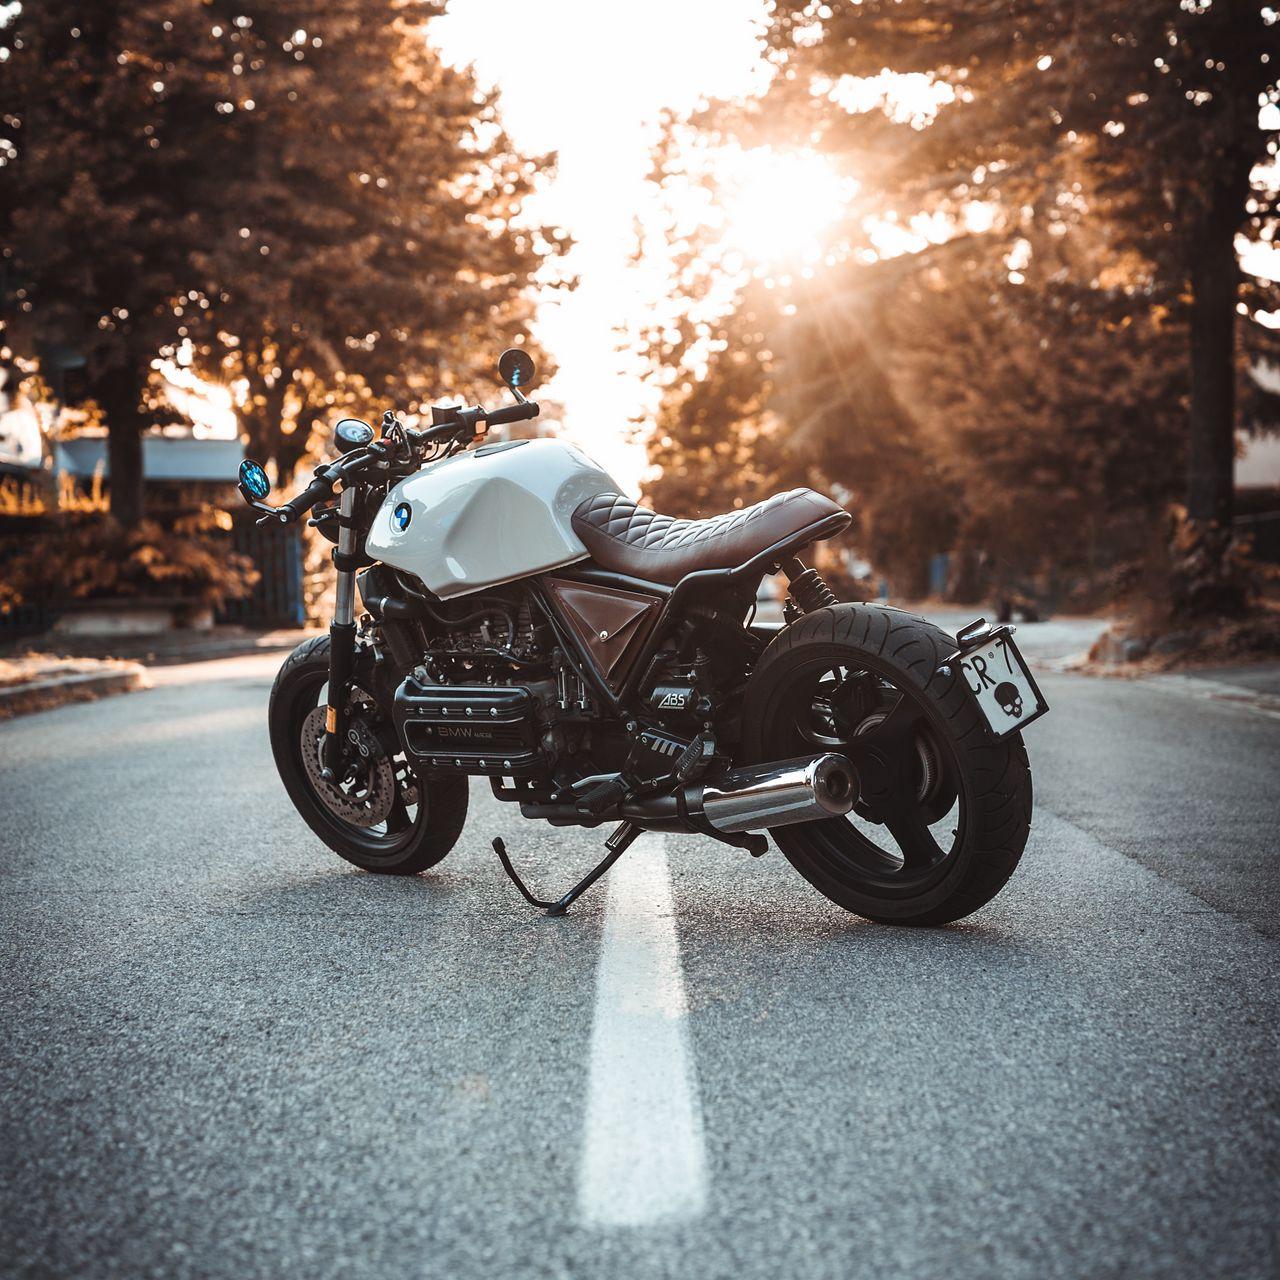 1280x1280 Обои bmw k100, мотоцикл, байк, вид сбоку